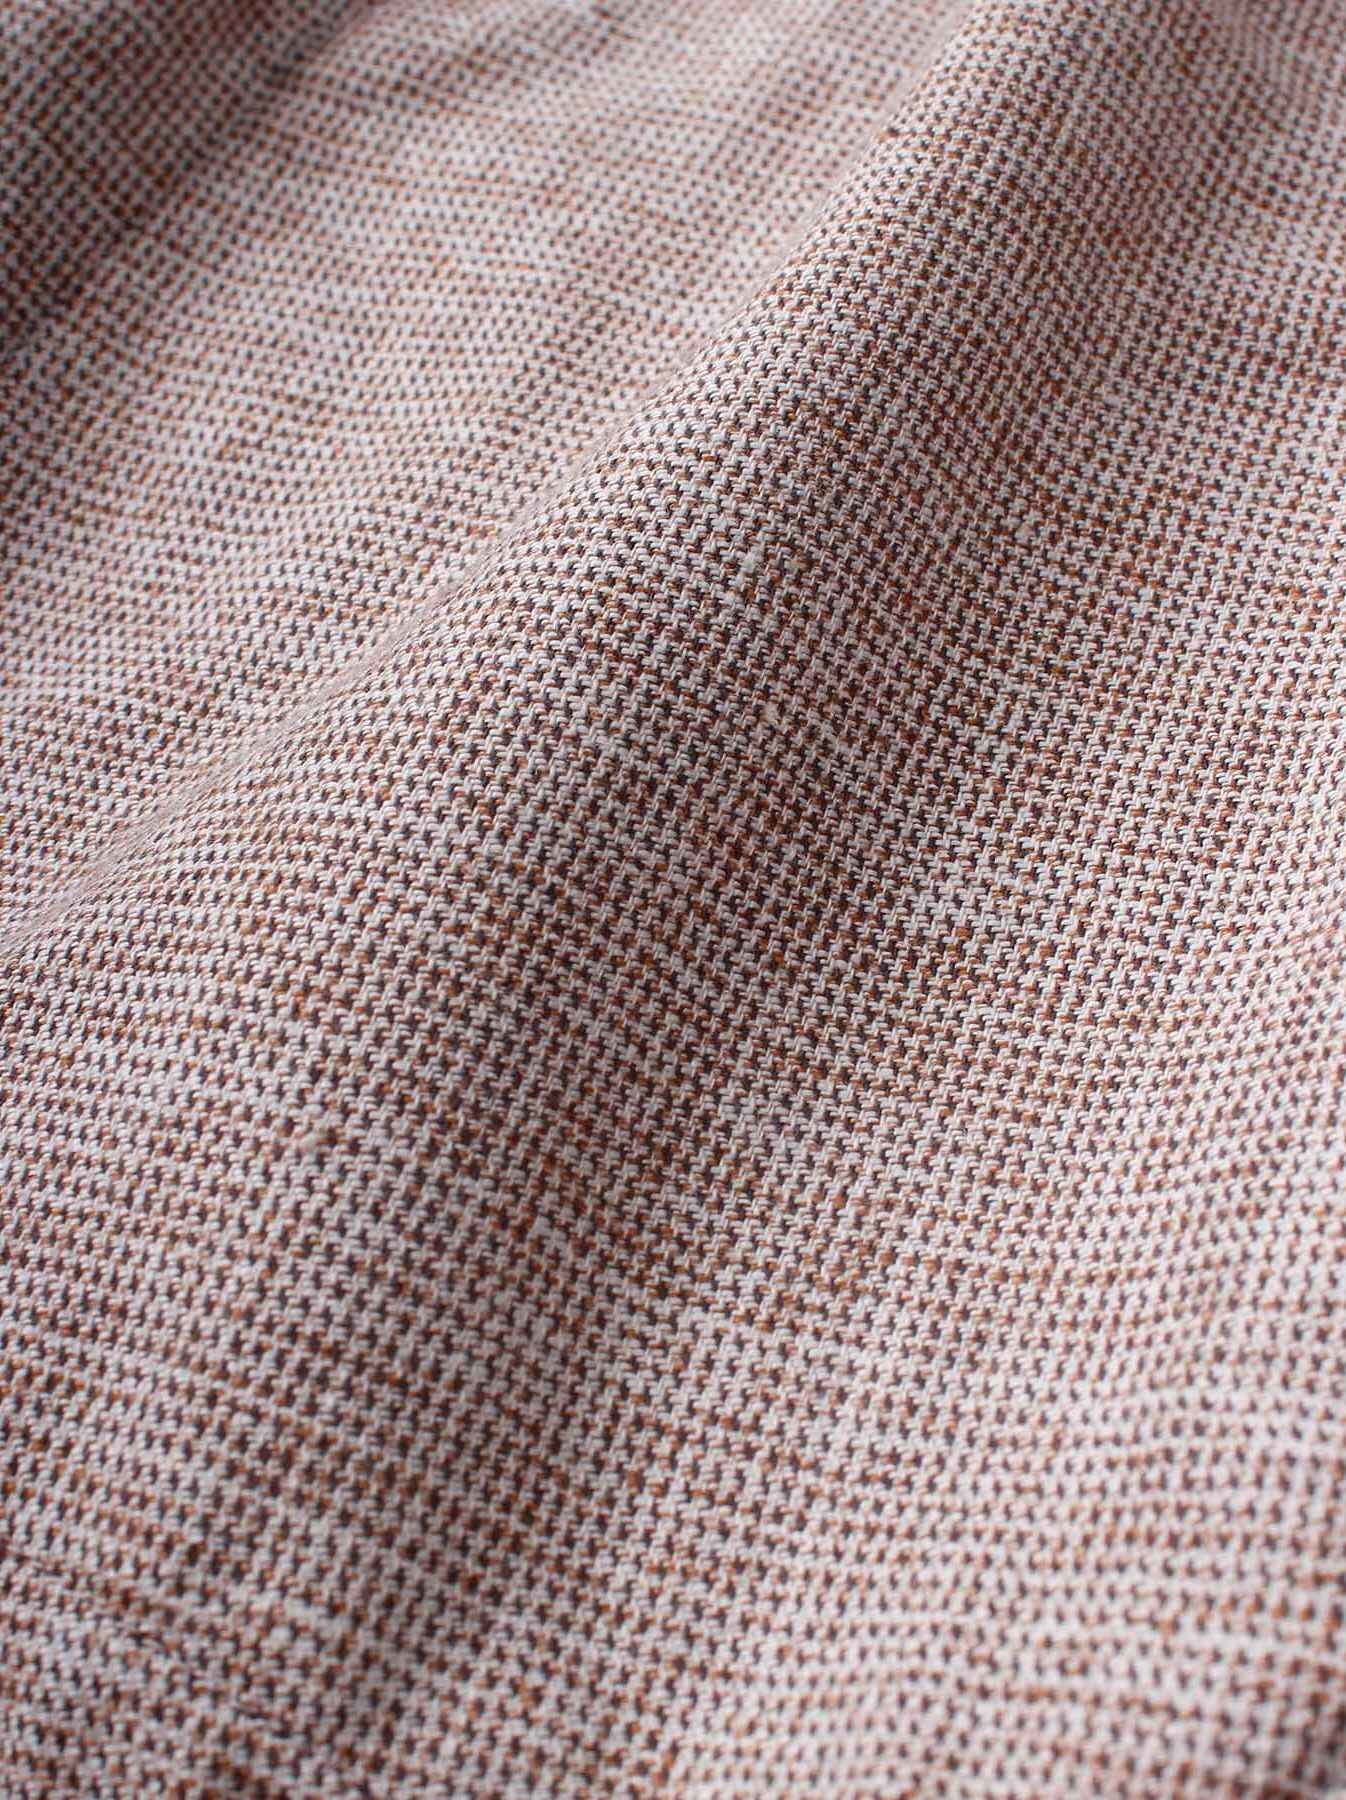 Cotton Tweed 908 Jacket-9